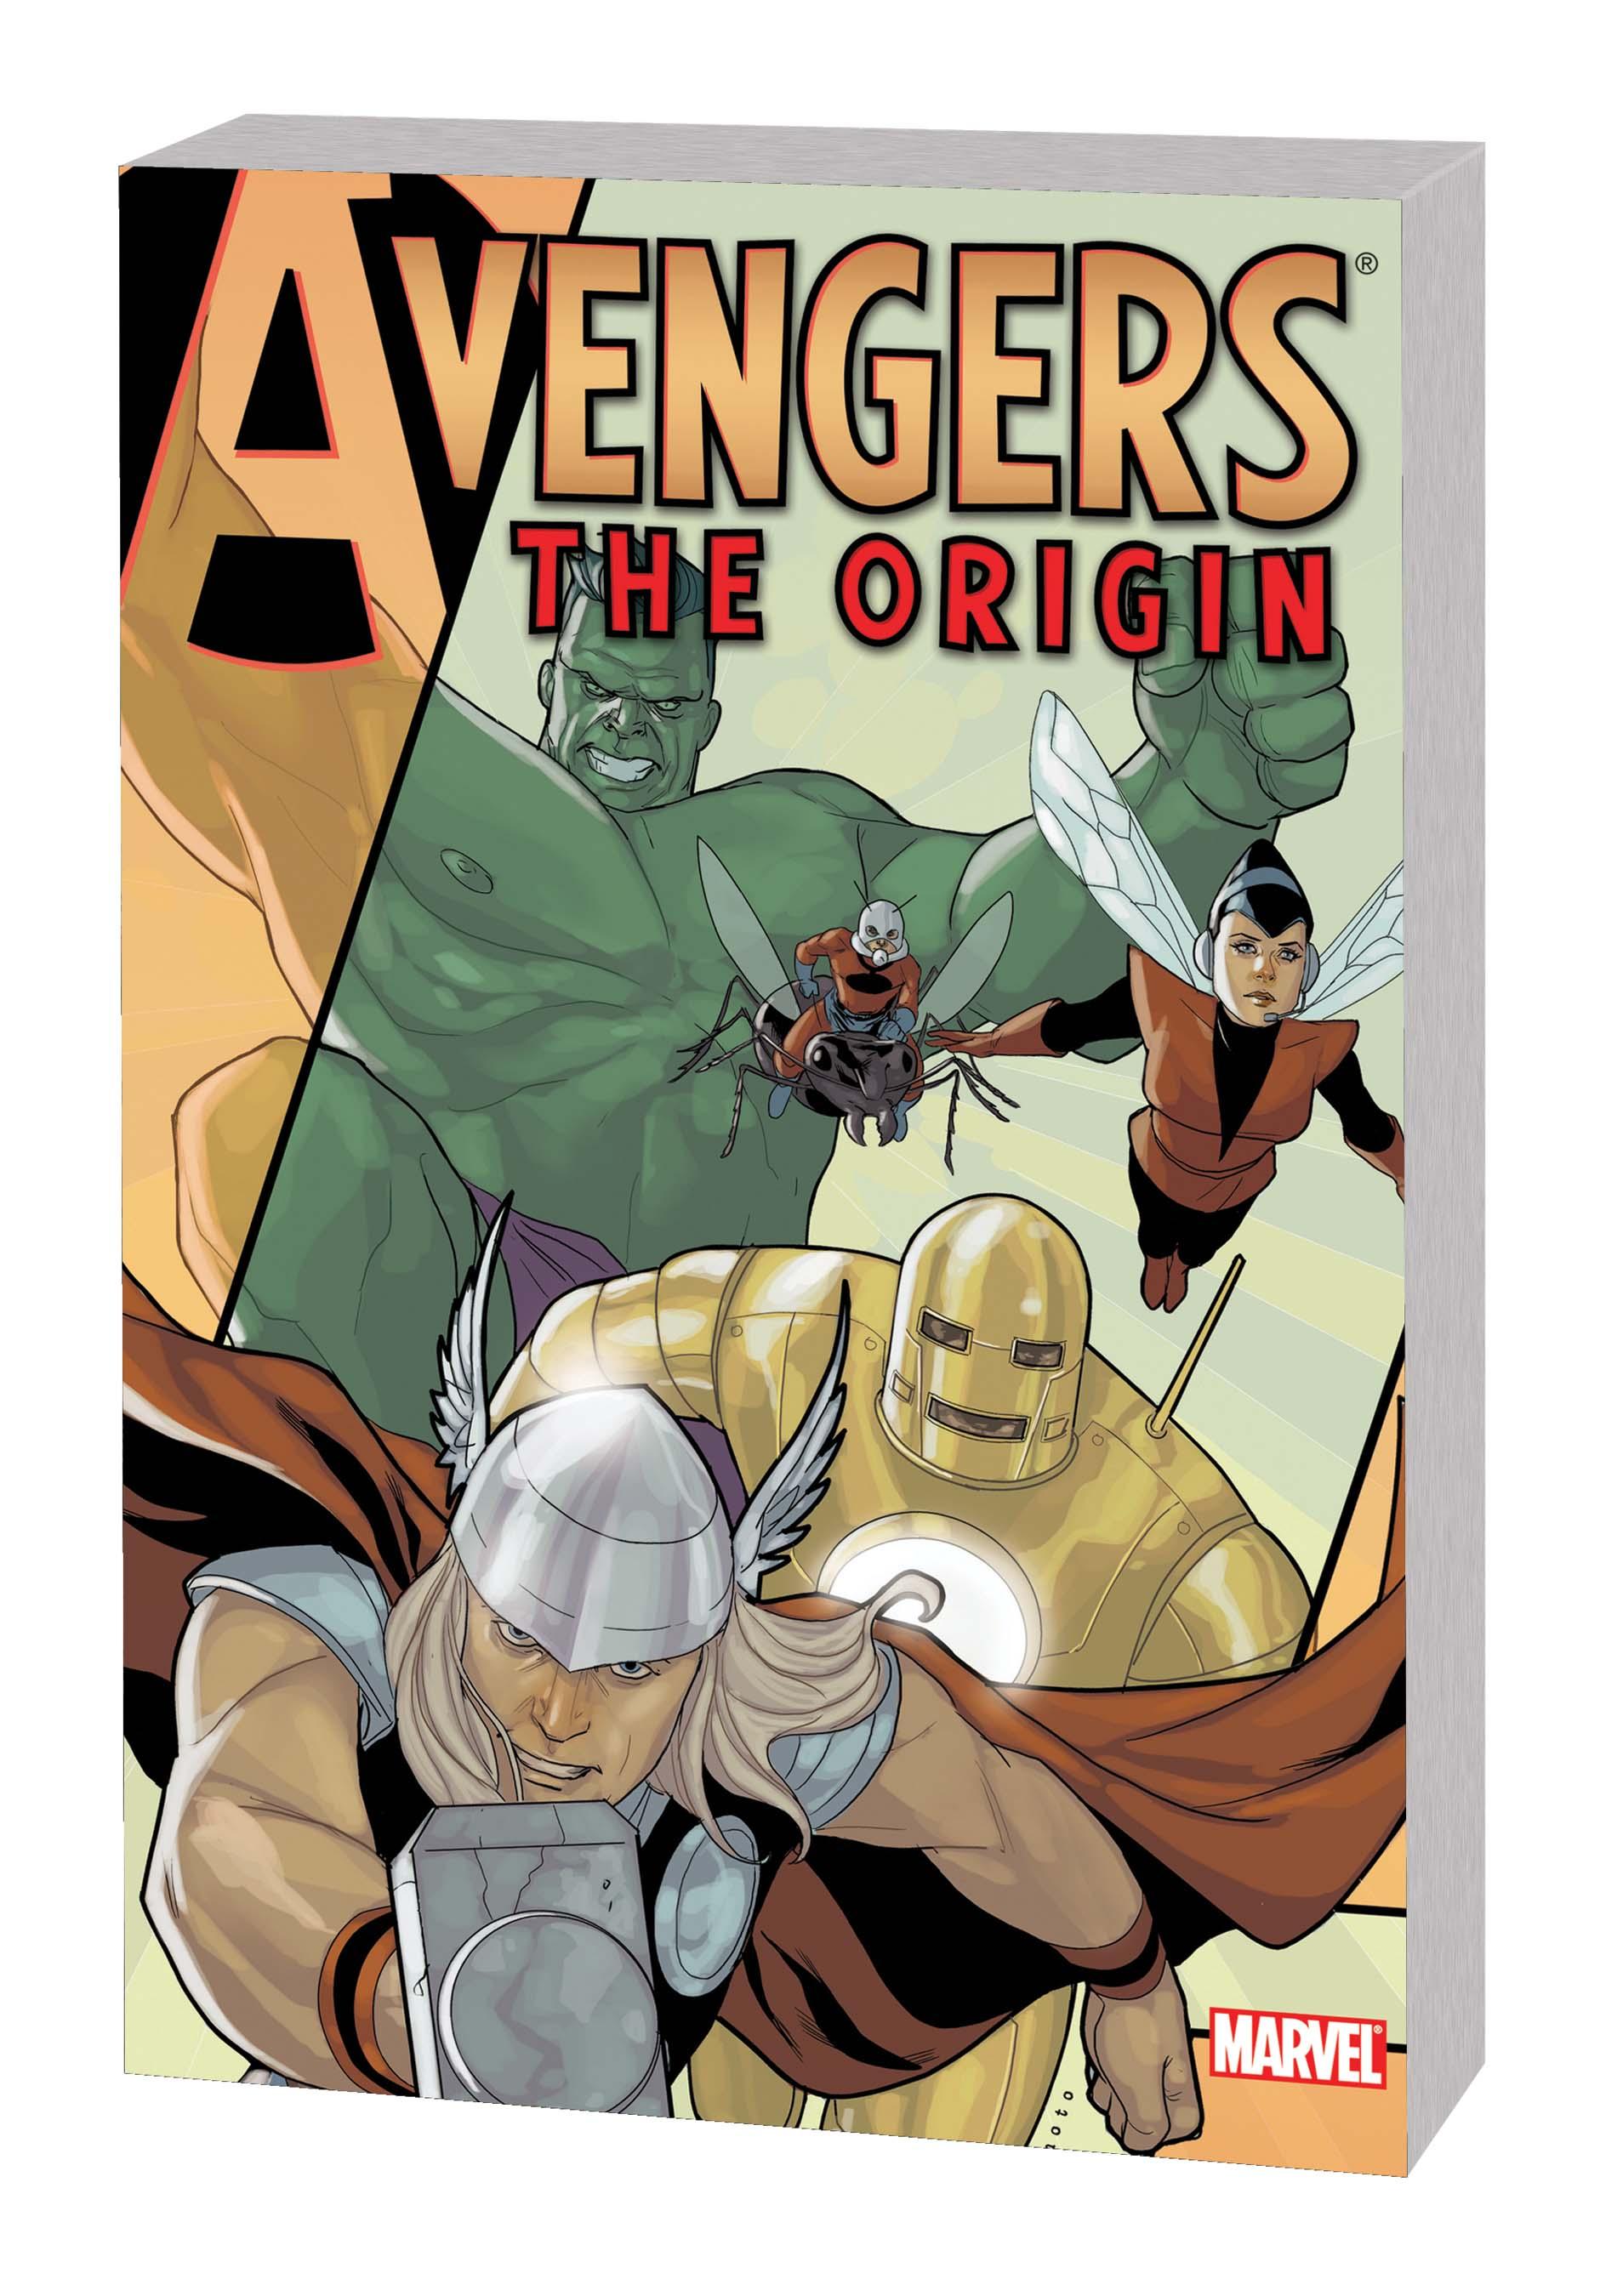 Avengers: The Origin (Trade Paperback)